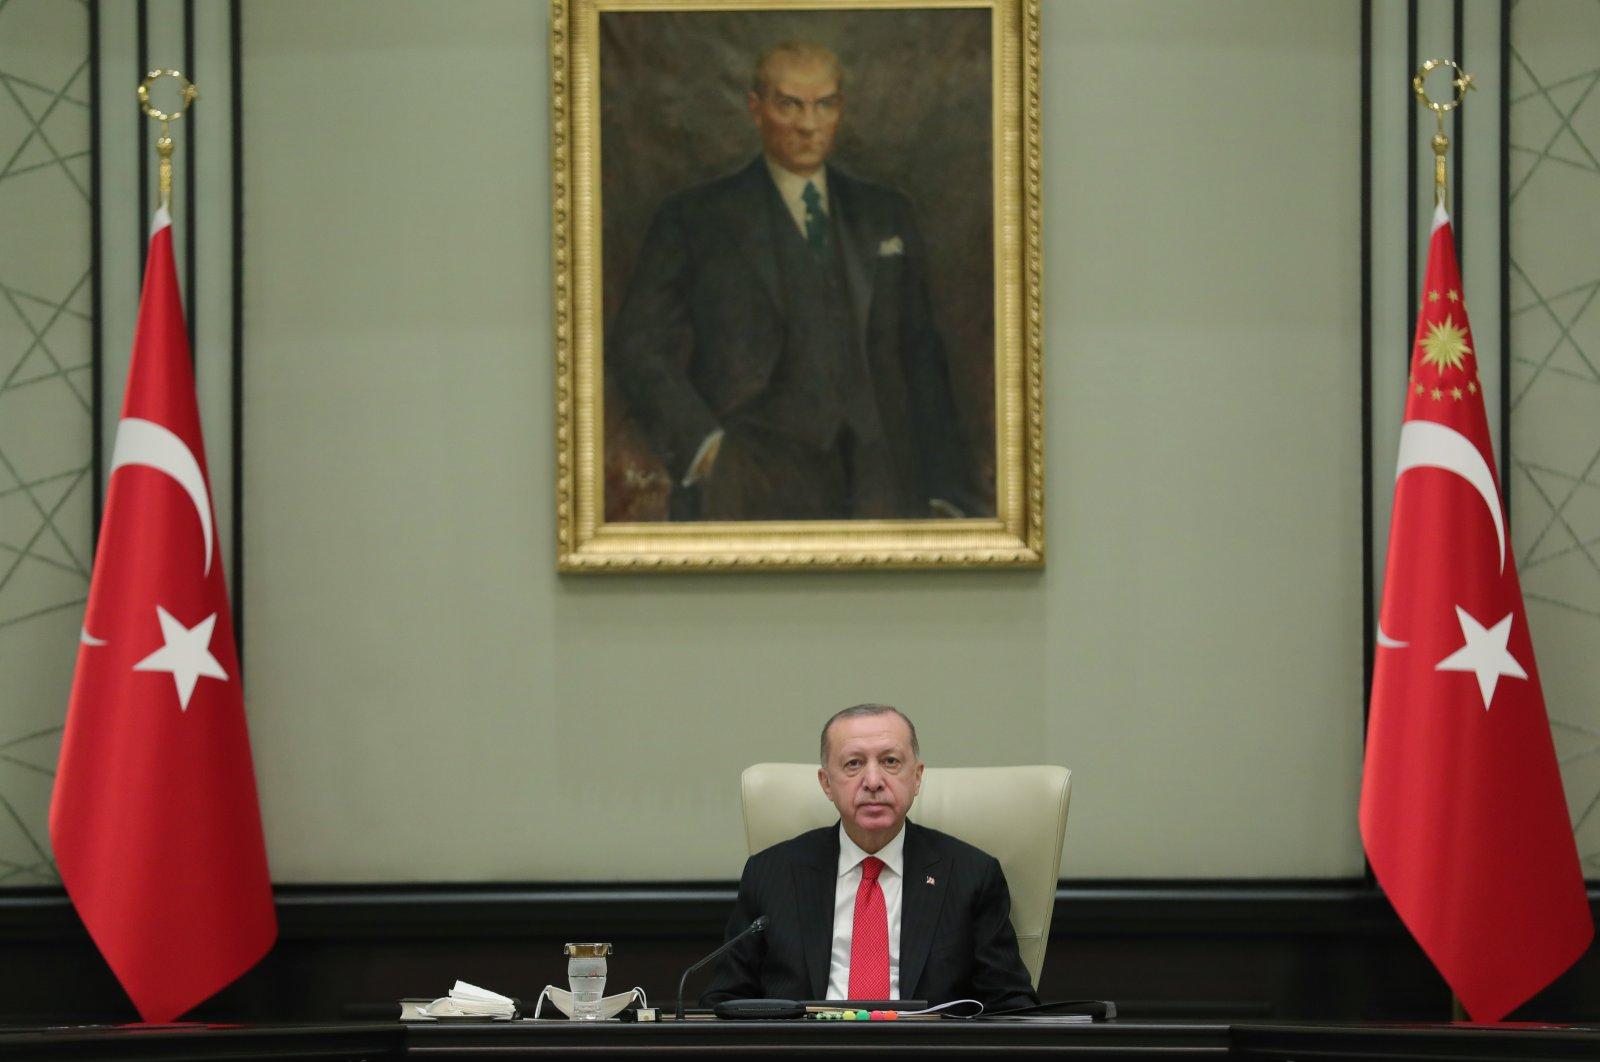 President Recep Tayyip Erdoğan ahead of a cabinet meeting in Ankara, Dec. 30, 2020. (AA)